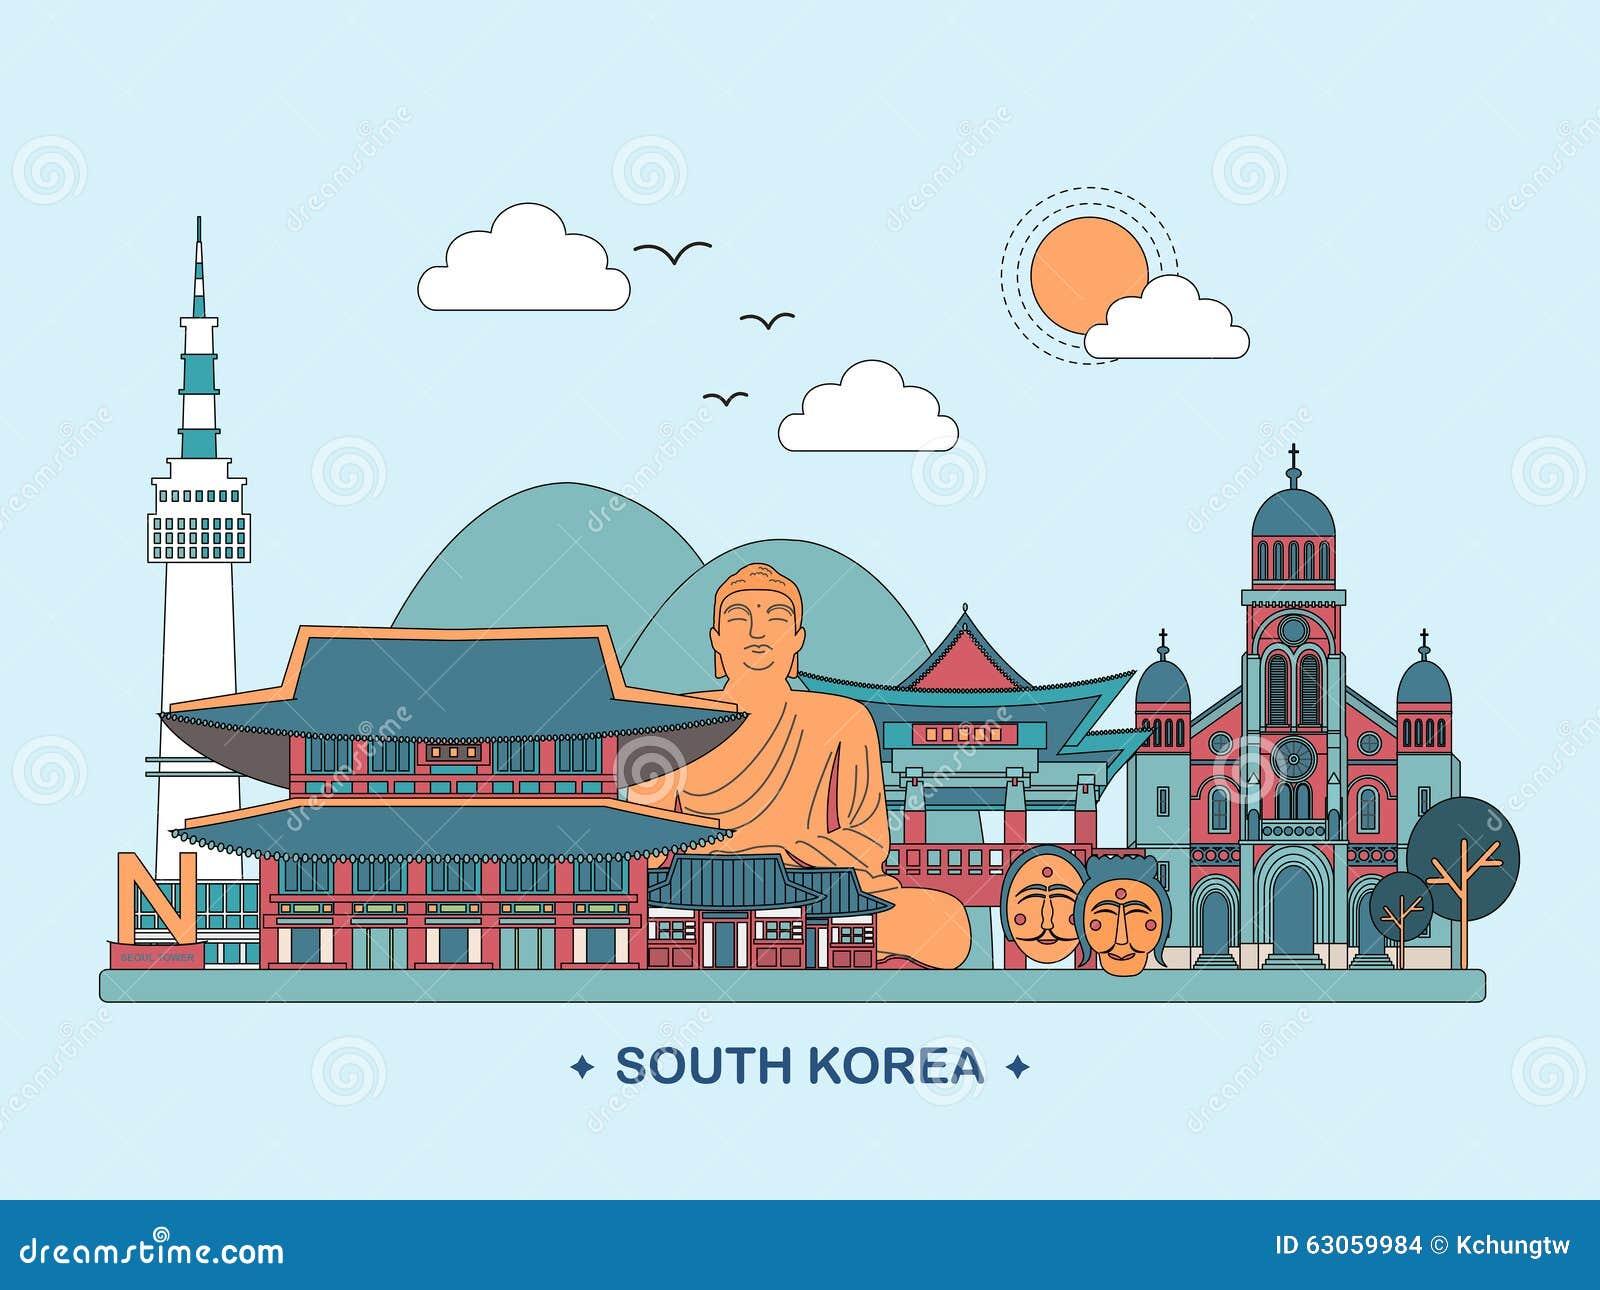 Korean poster design - Korea